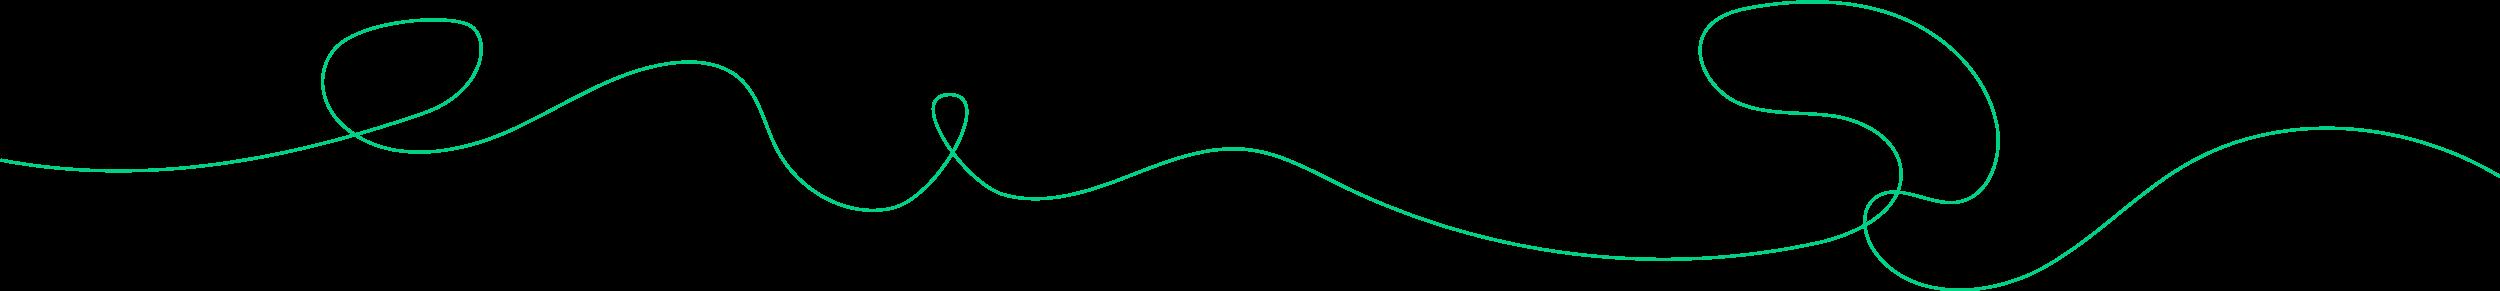 Green Line Background Image